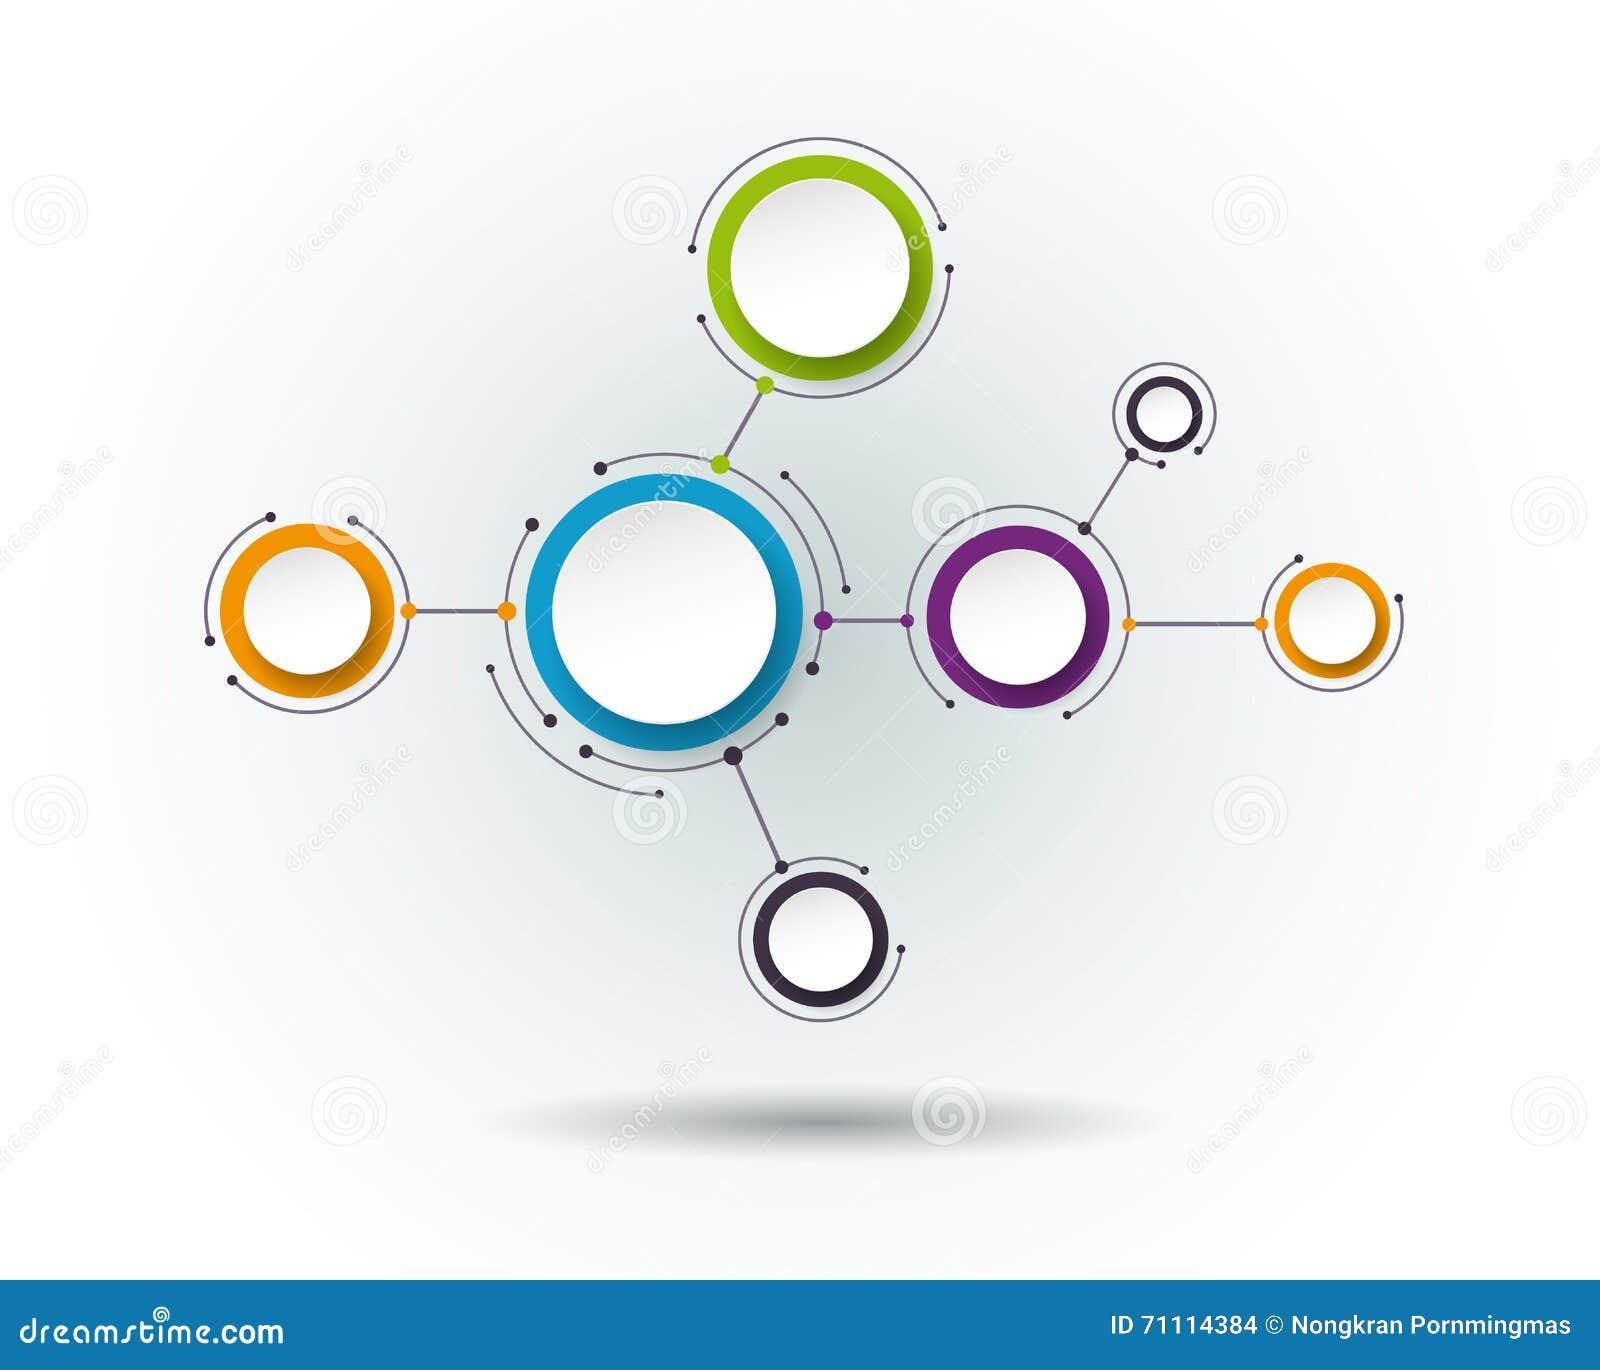 Integrative Network Design Project